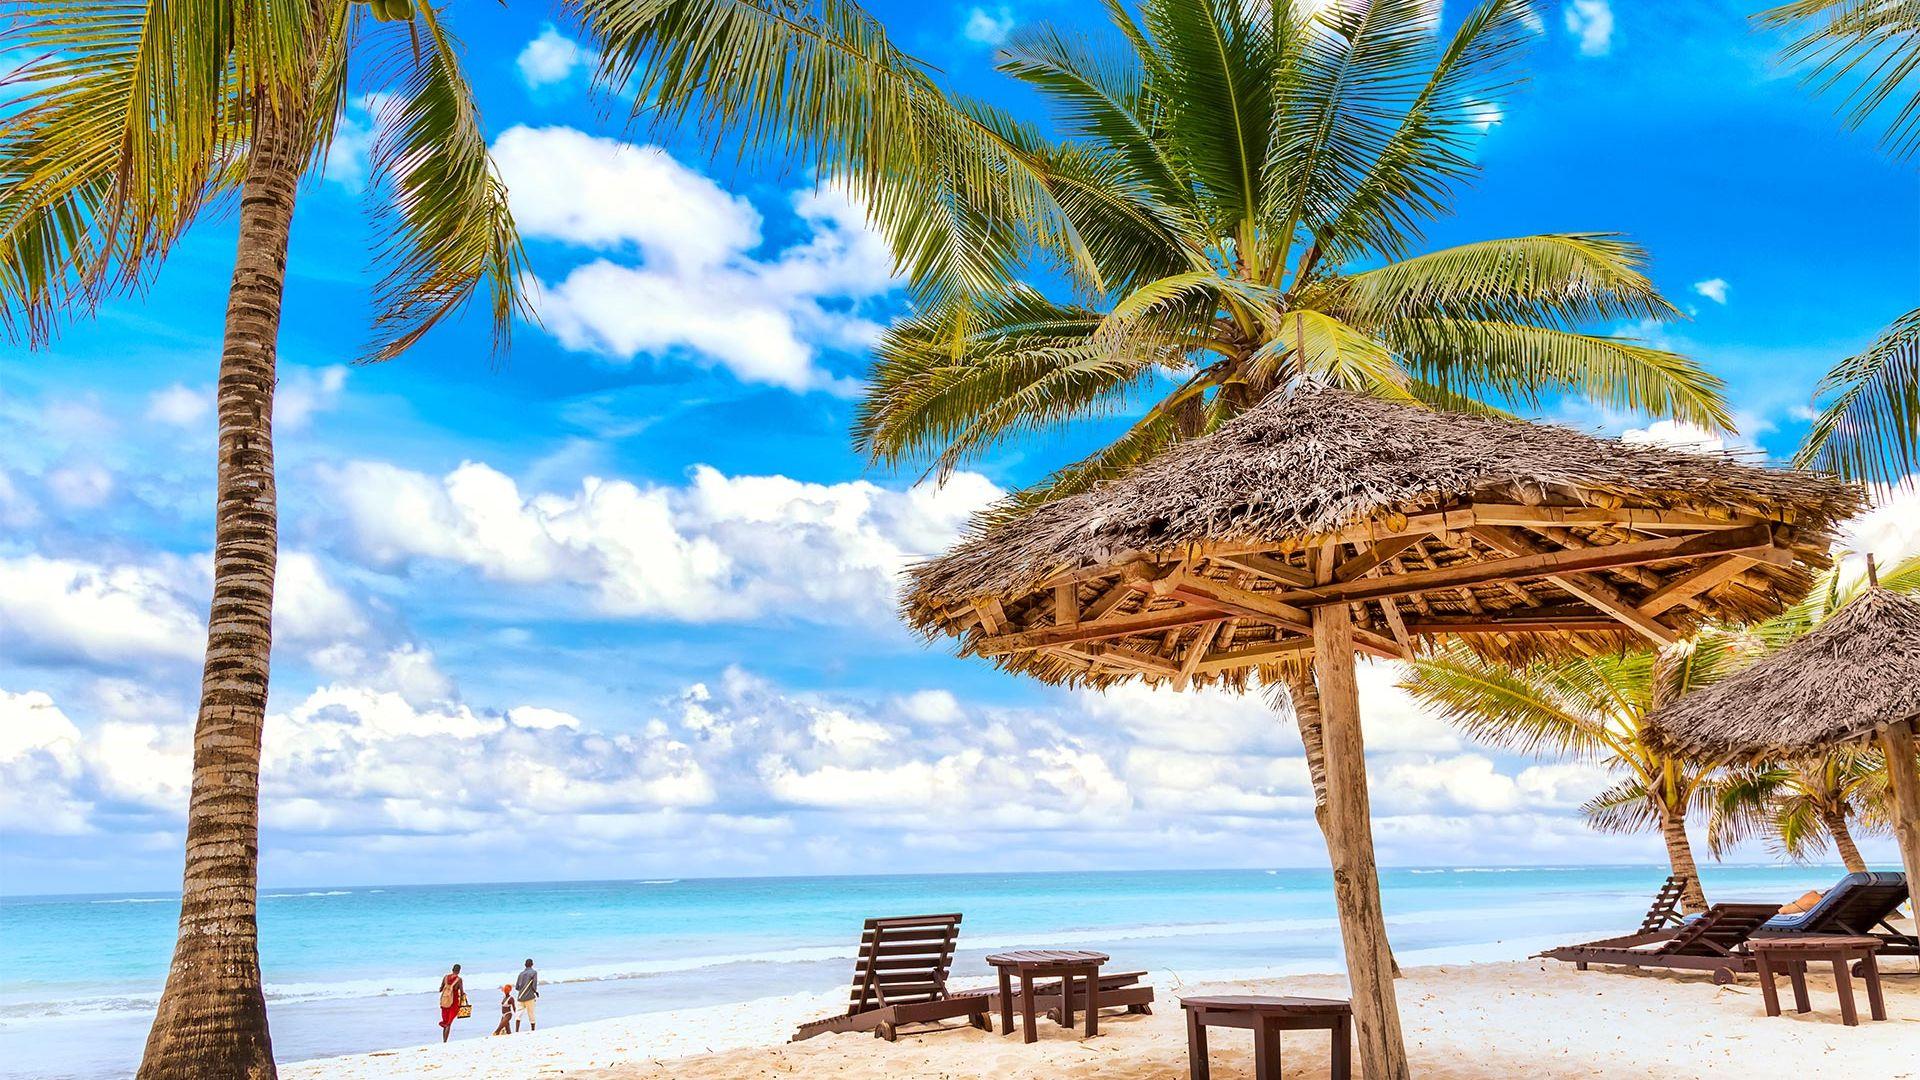 Oferta Zilei - Sejur charter Southern Palm Beach Resort, Kenya, 8 zile - 05 iulie 2021